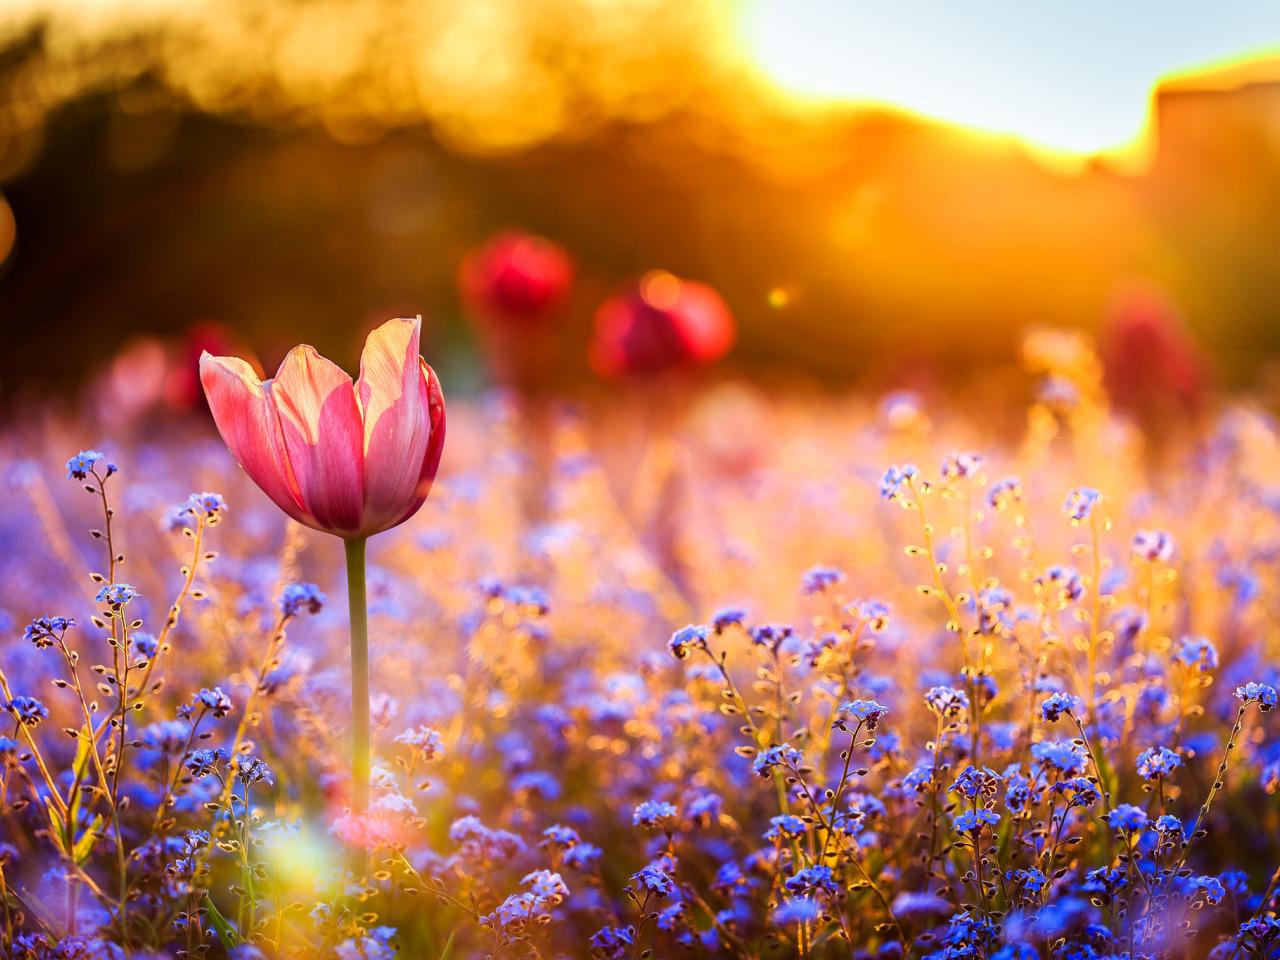 Фото цветы полевые на закате